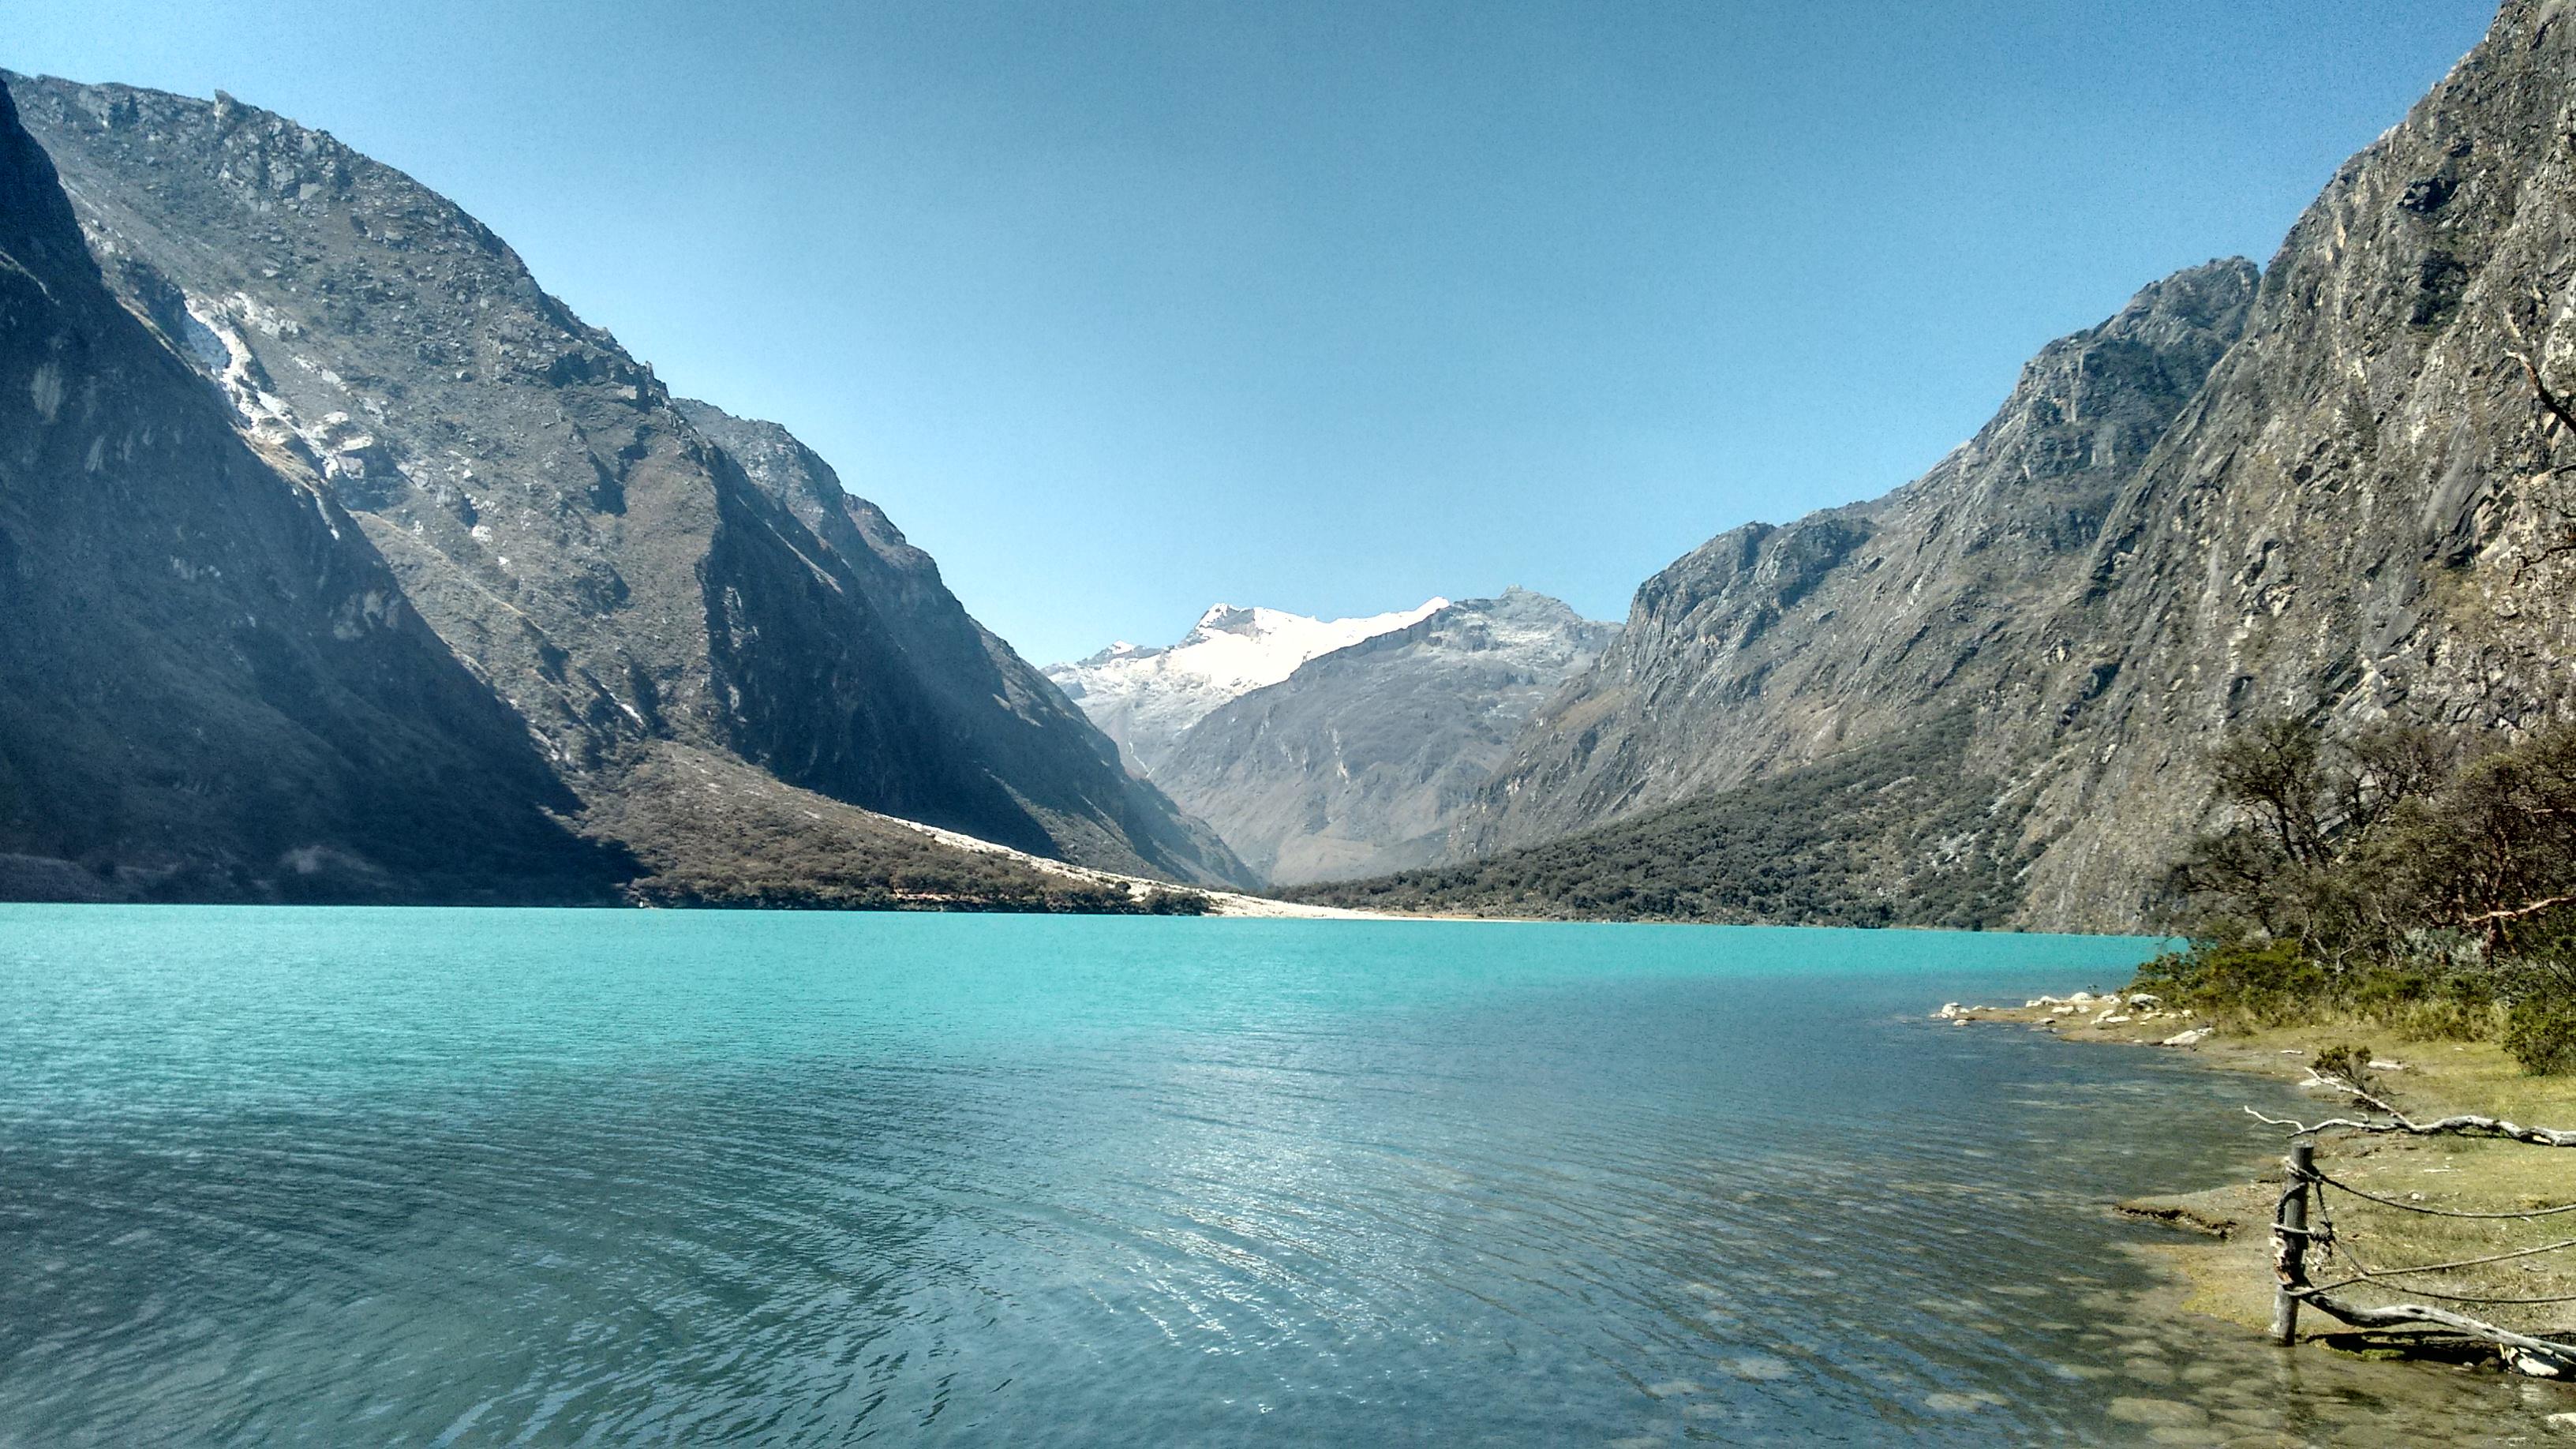 File:Laguna Llanganuco.jpg - Wikimedia Commons